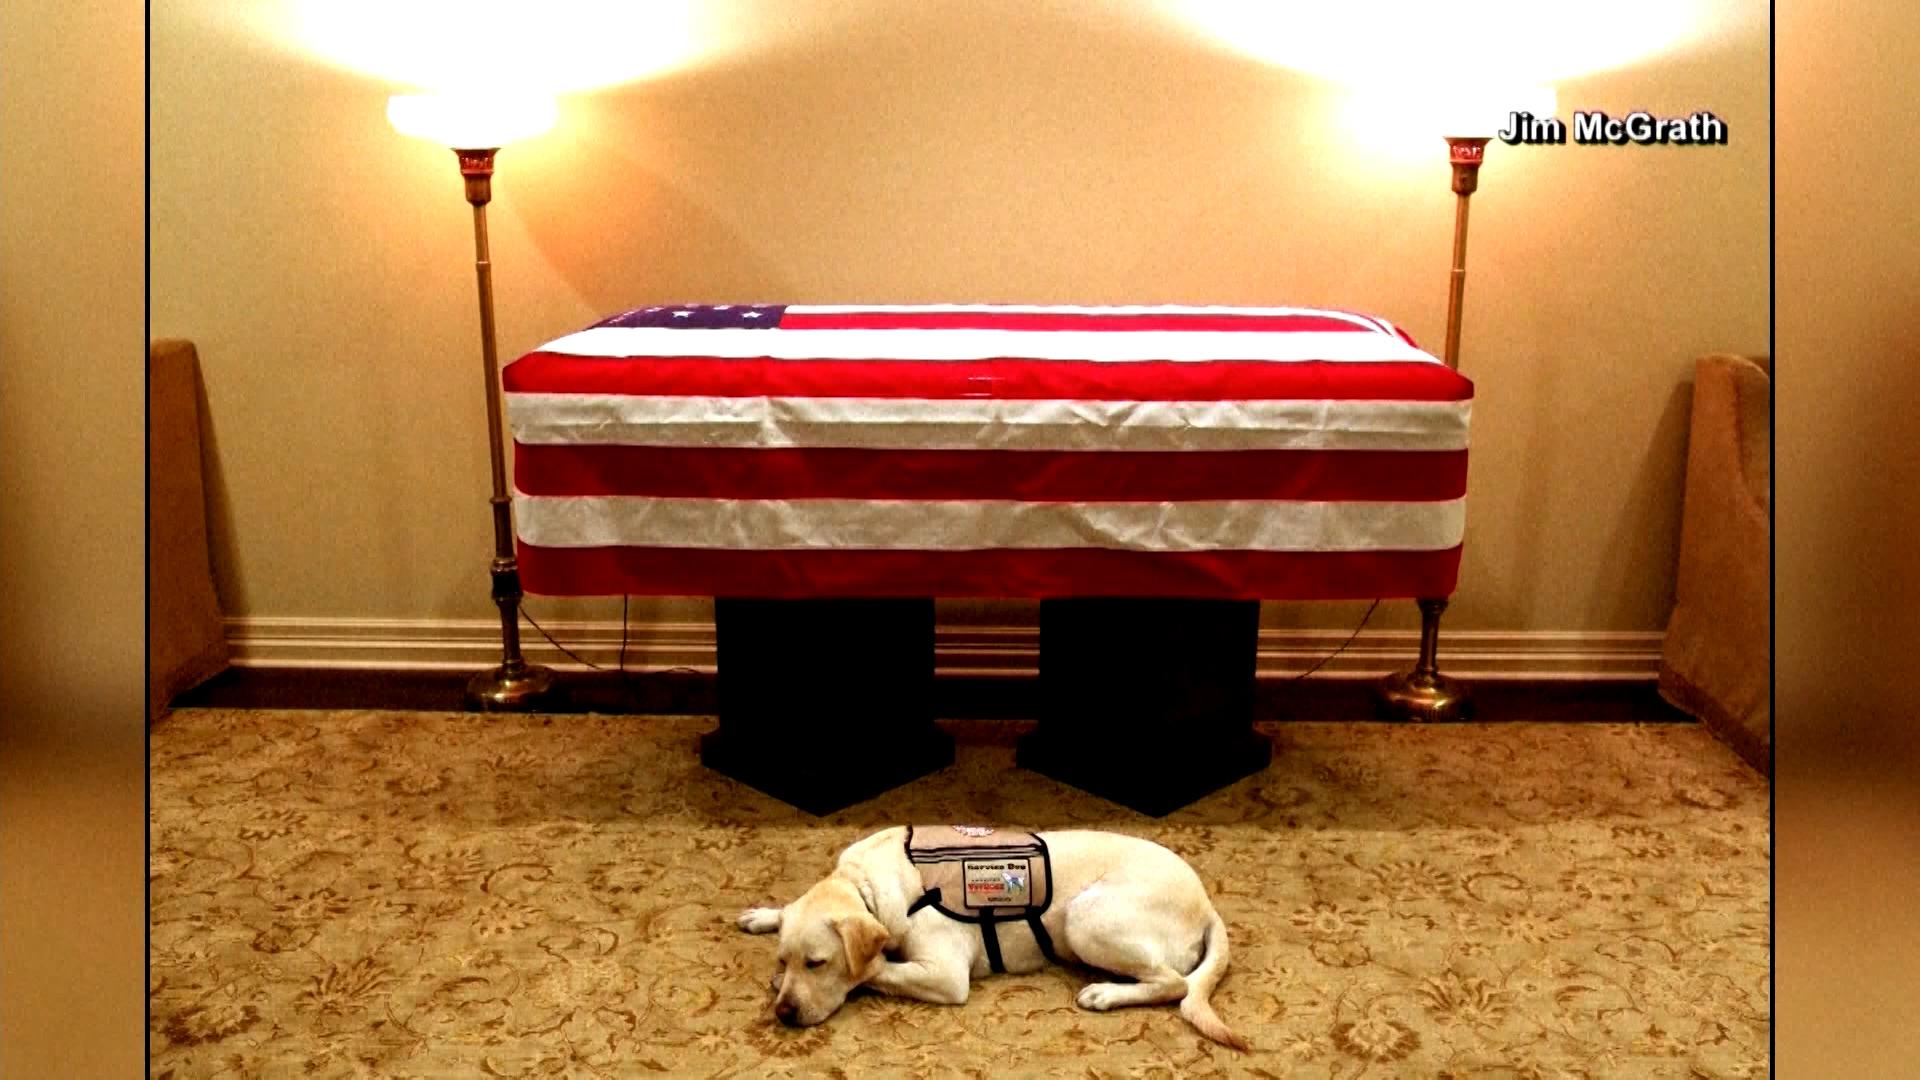 Body Of George H.W. Bush Returns To Washington